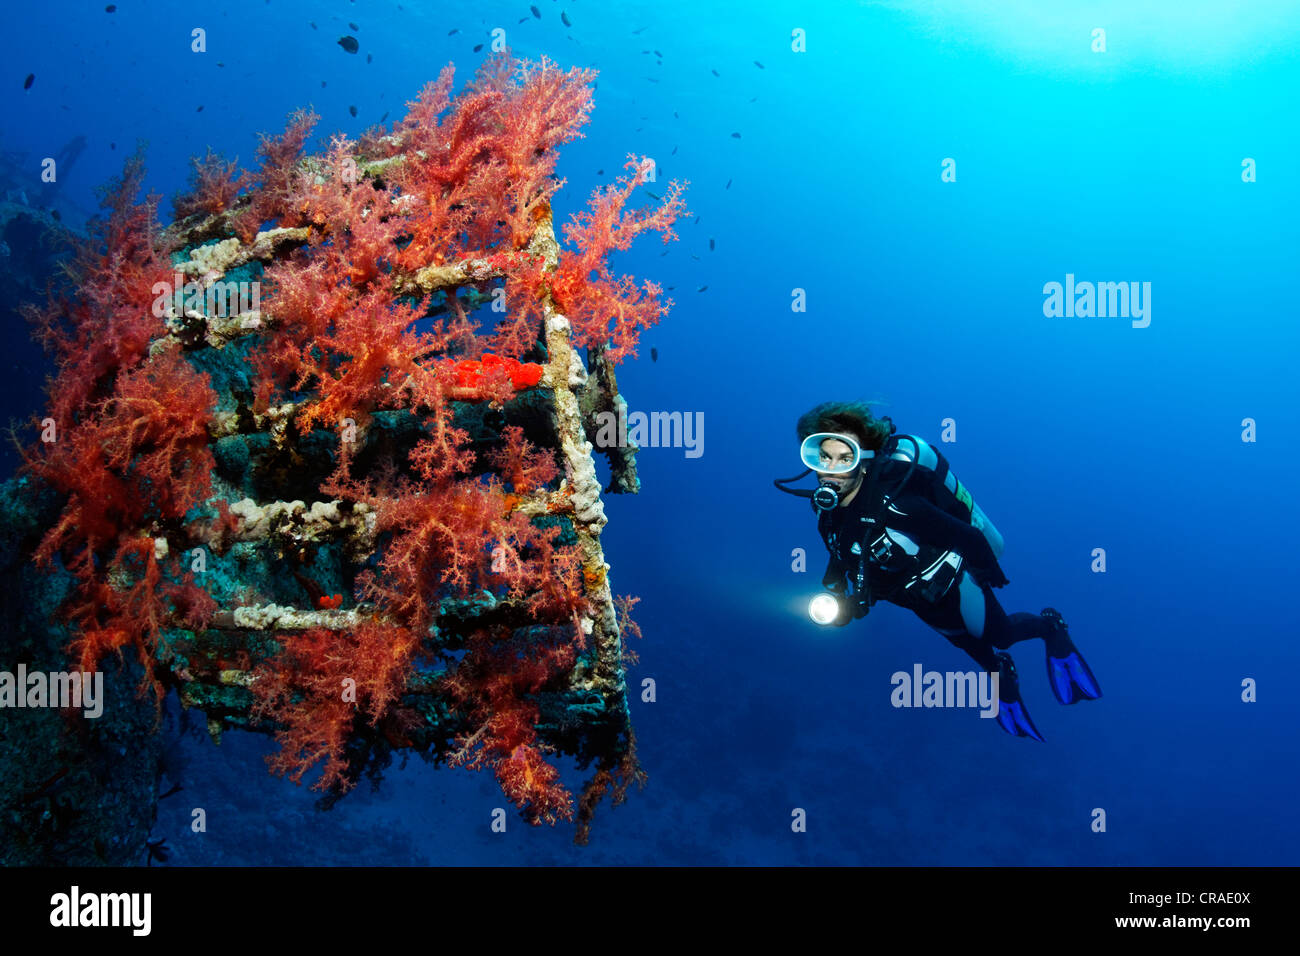 Taucher am Lookout overcrusted mit lebendigen Broccoli Korallen (Dendronephthya Klunzingeri), Schiffswrack, Cedar Stockbild